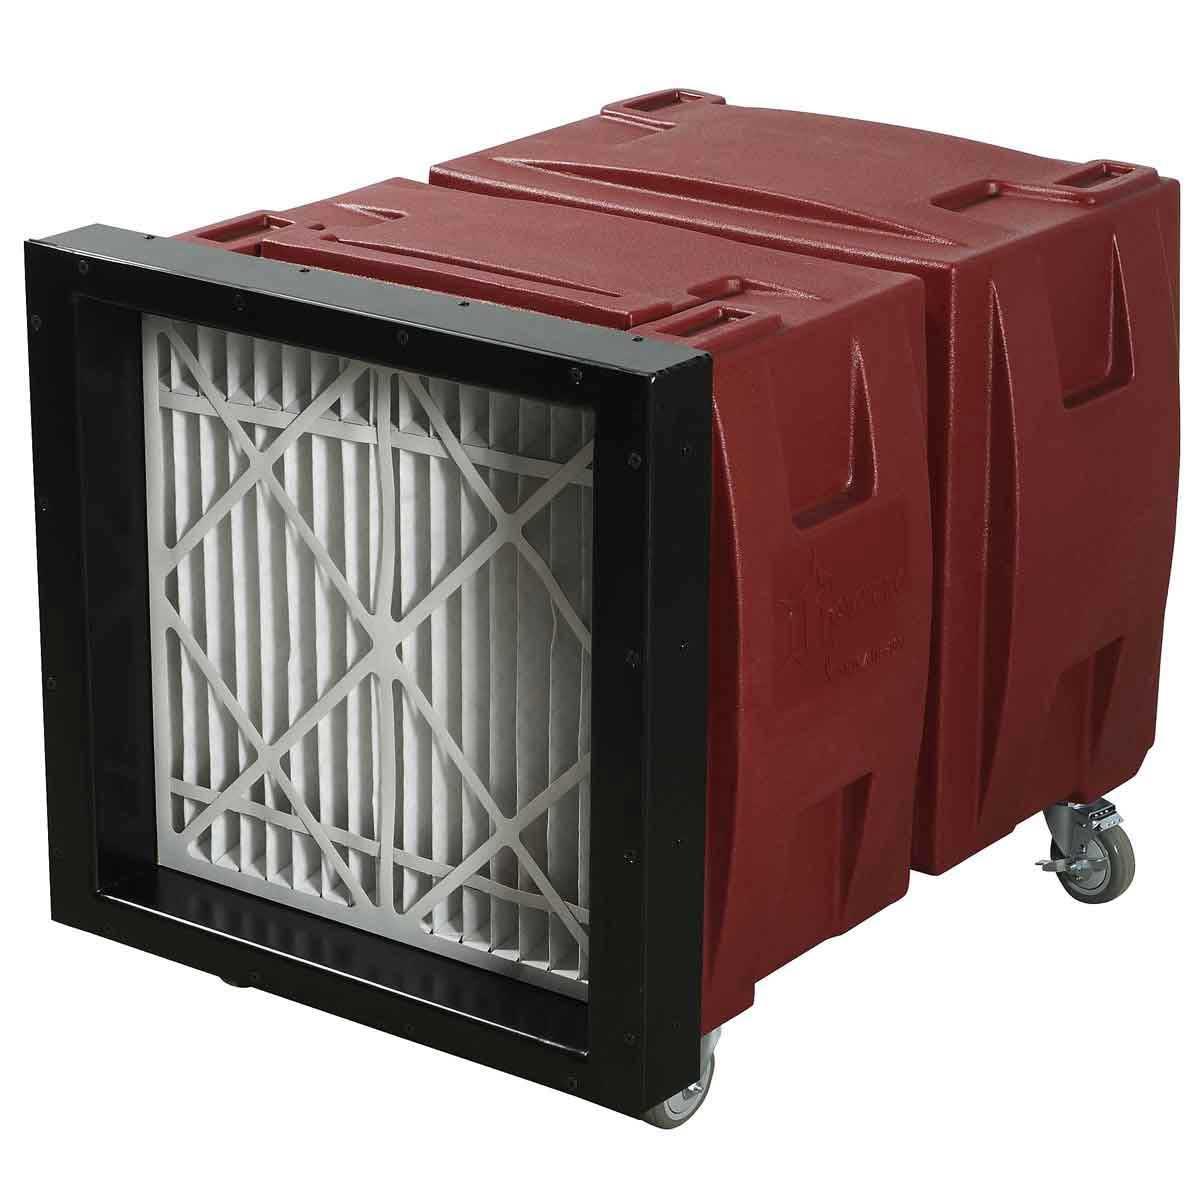 Novair 2000 BIO Air Filtration System